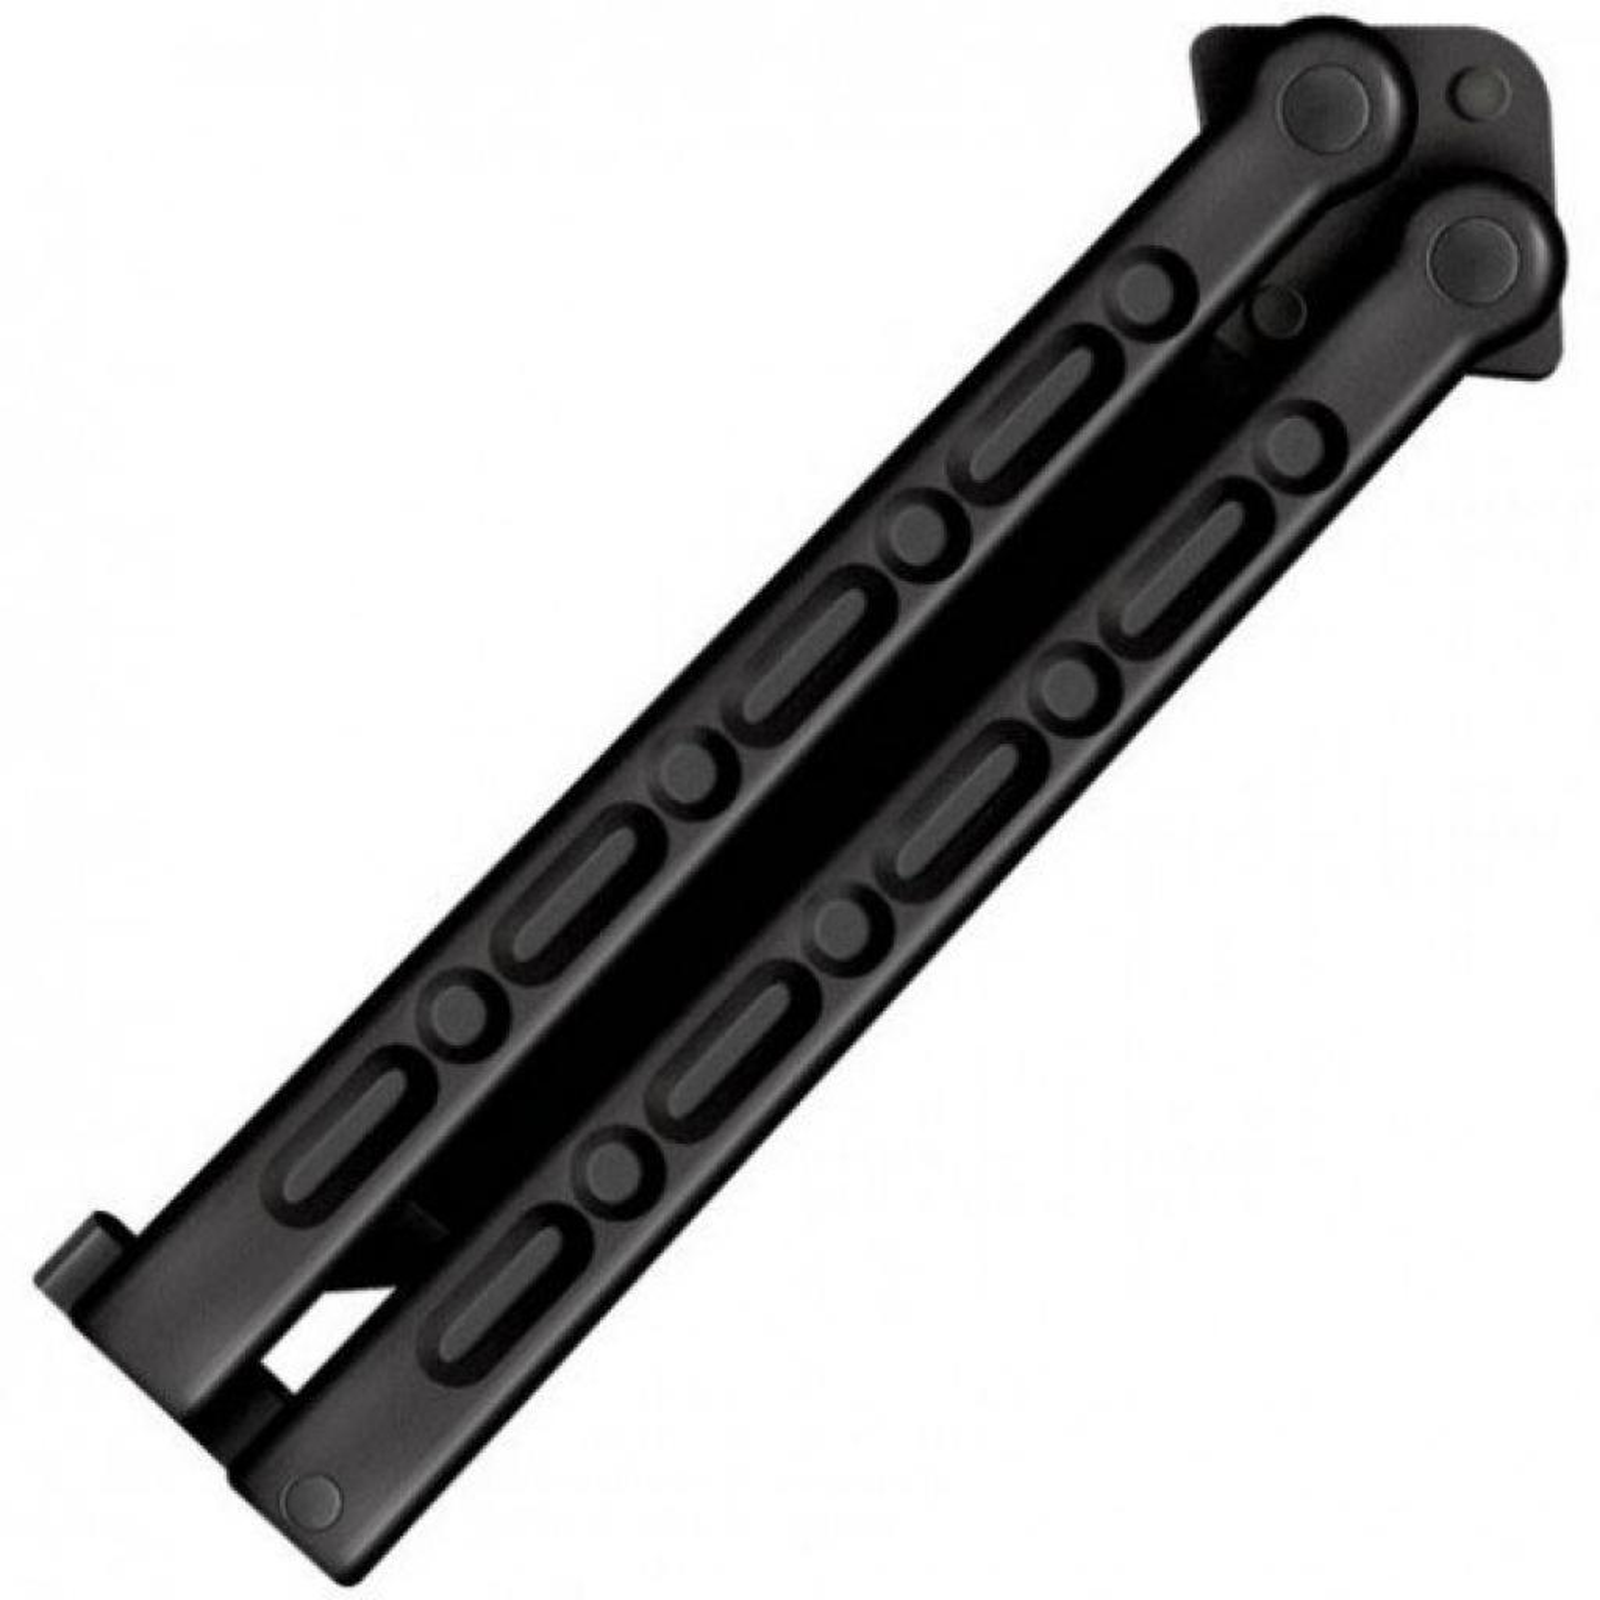 Нож Cold Steel FGX Balisong Tanto (92EAB) изображение 2